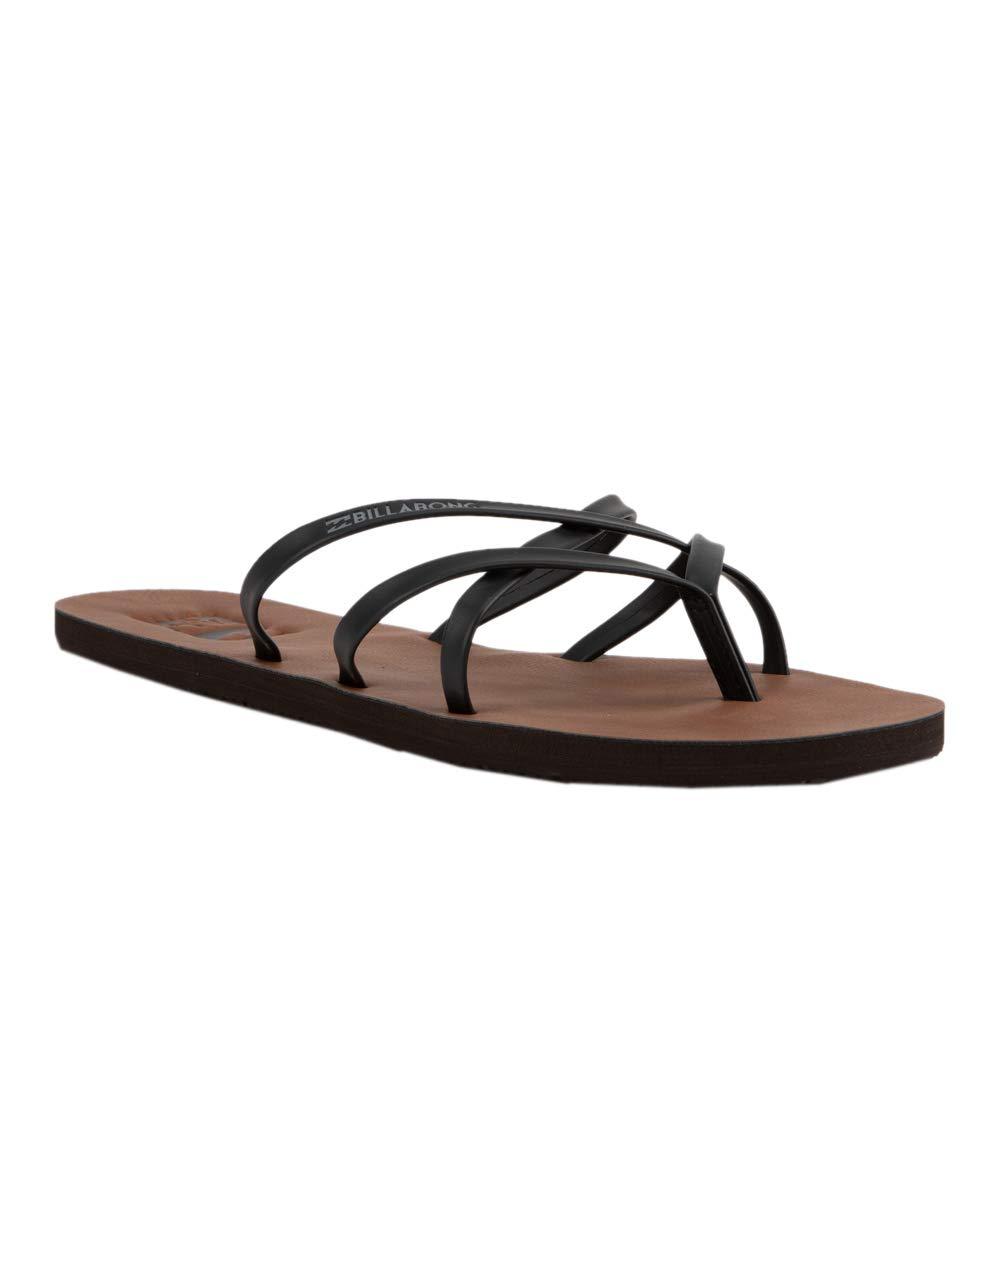 buy white sandals online